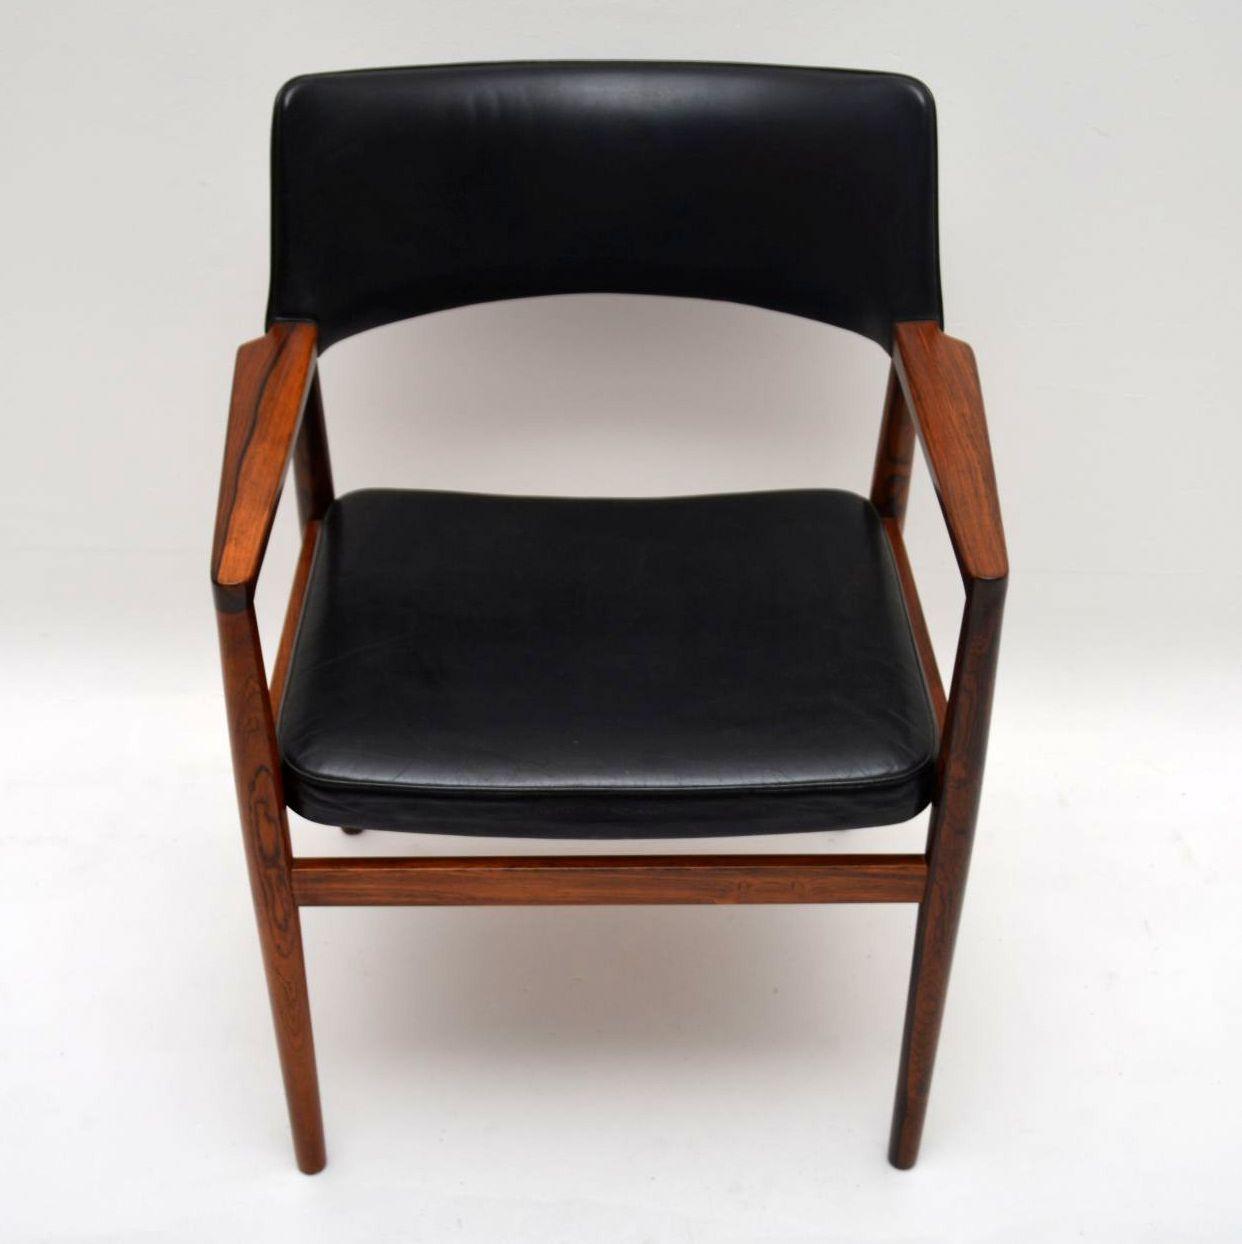 Danish Rosewood Amp Leather Retro Armchair Vintage 1960 S